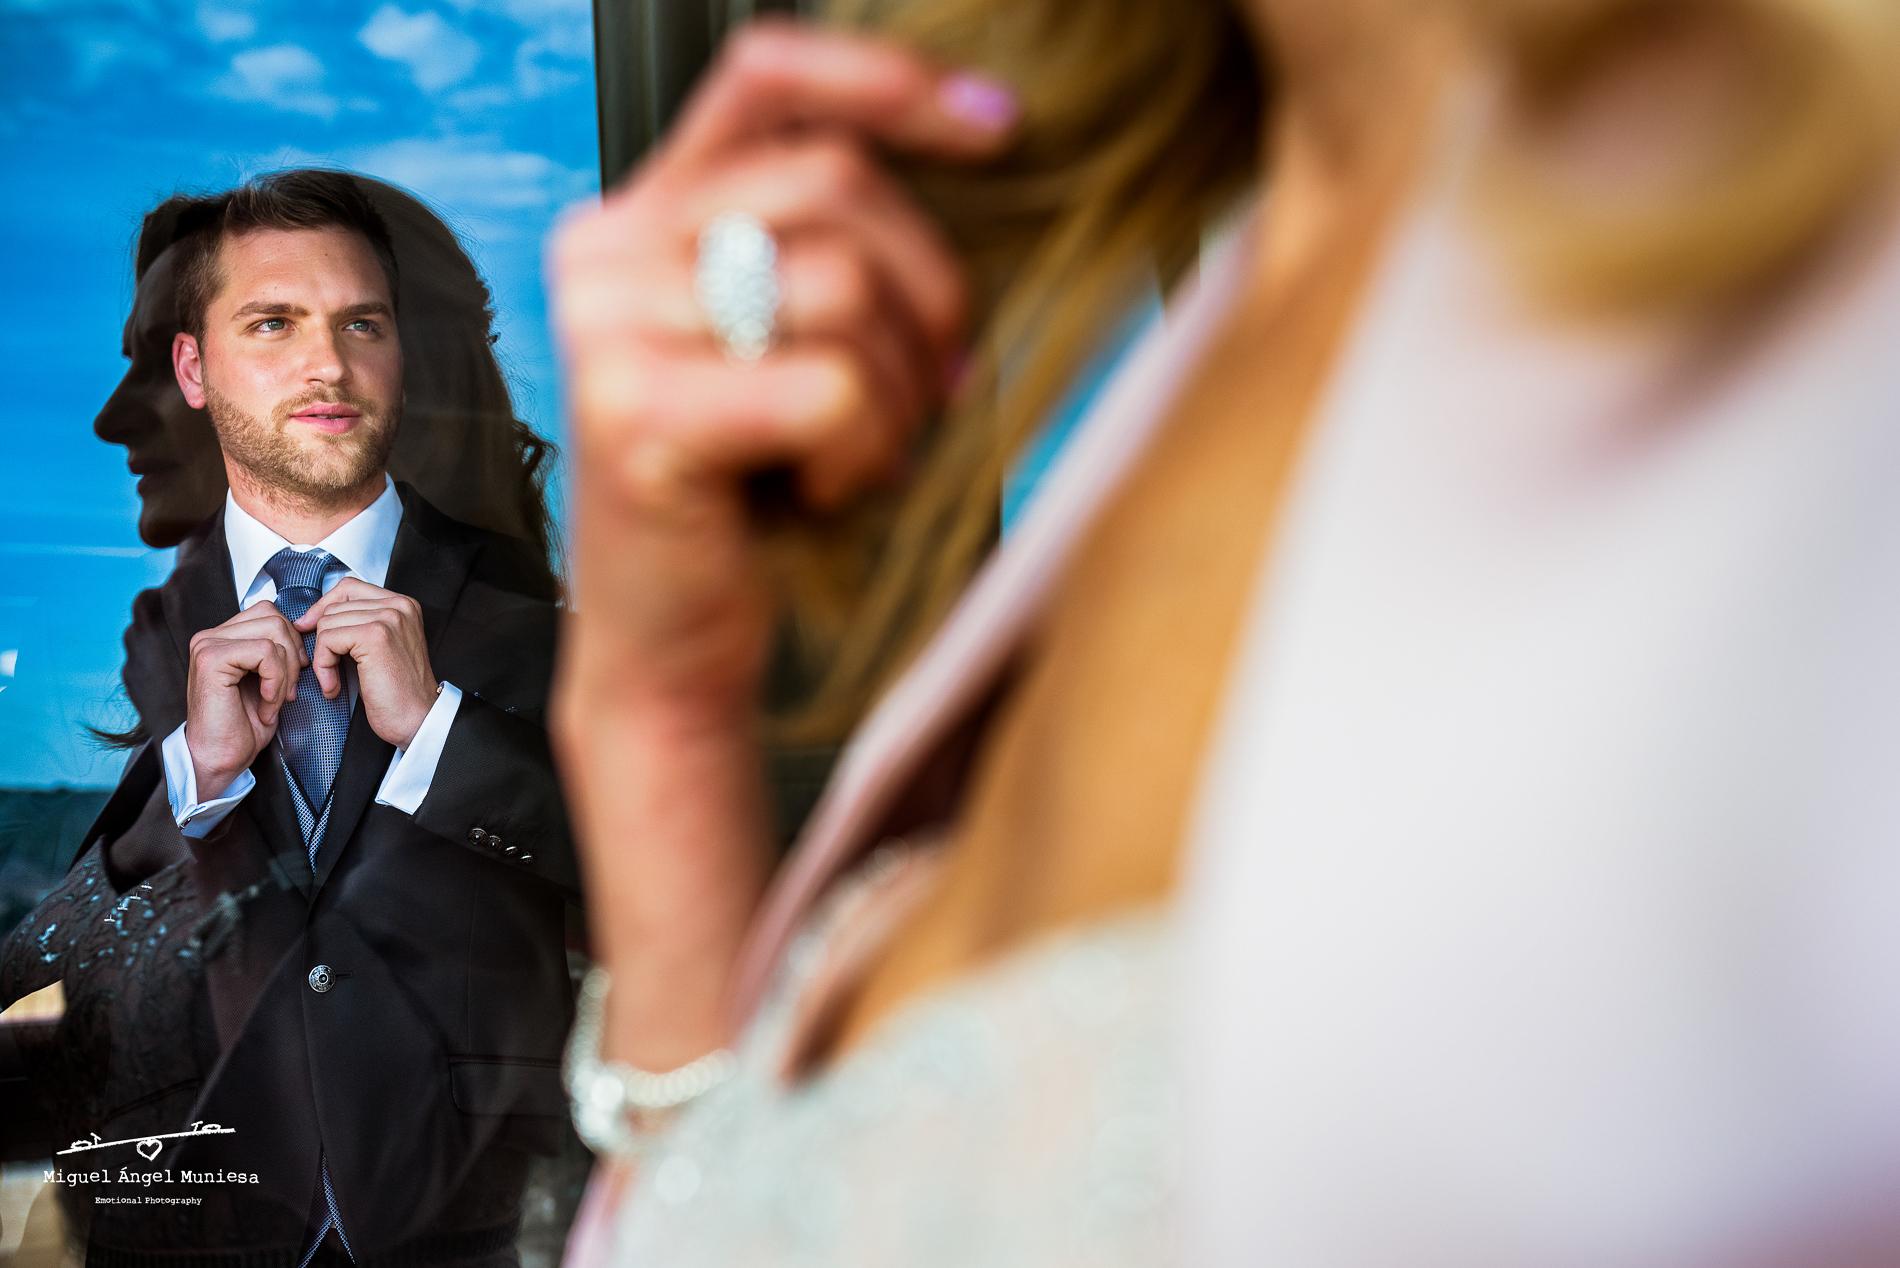 miguel angel muniesa, fotografo boda Teruel, fotografo boda navarra, fotografo boda zaragoza, fotografo boda soria, miguel angel muniesa emotional photography_11